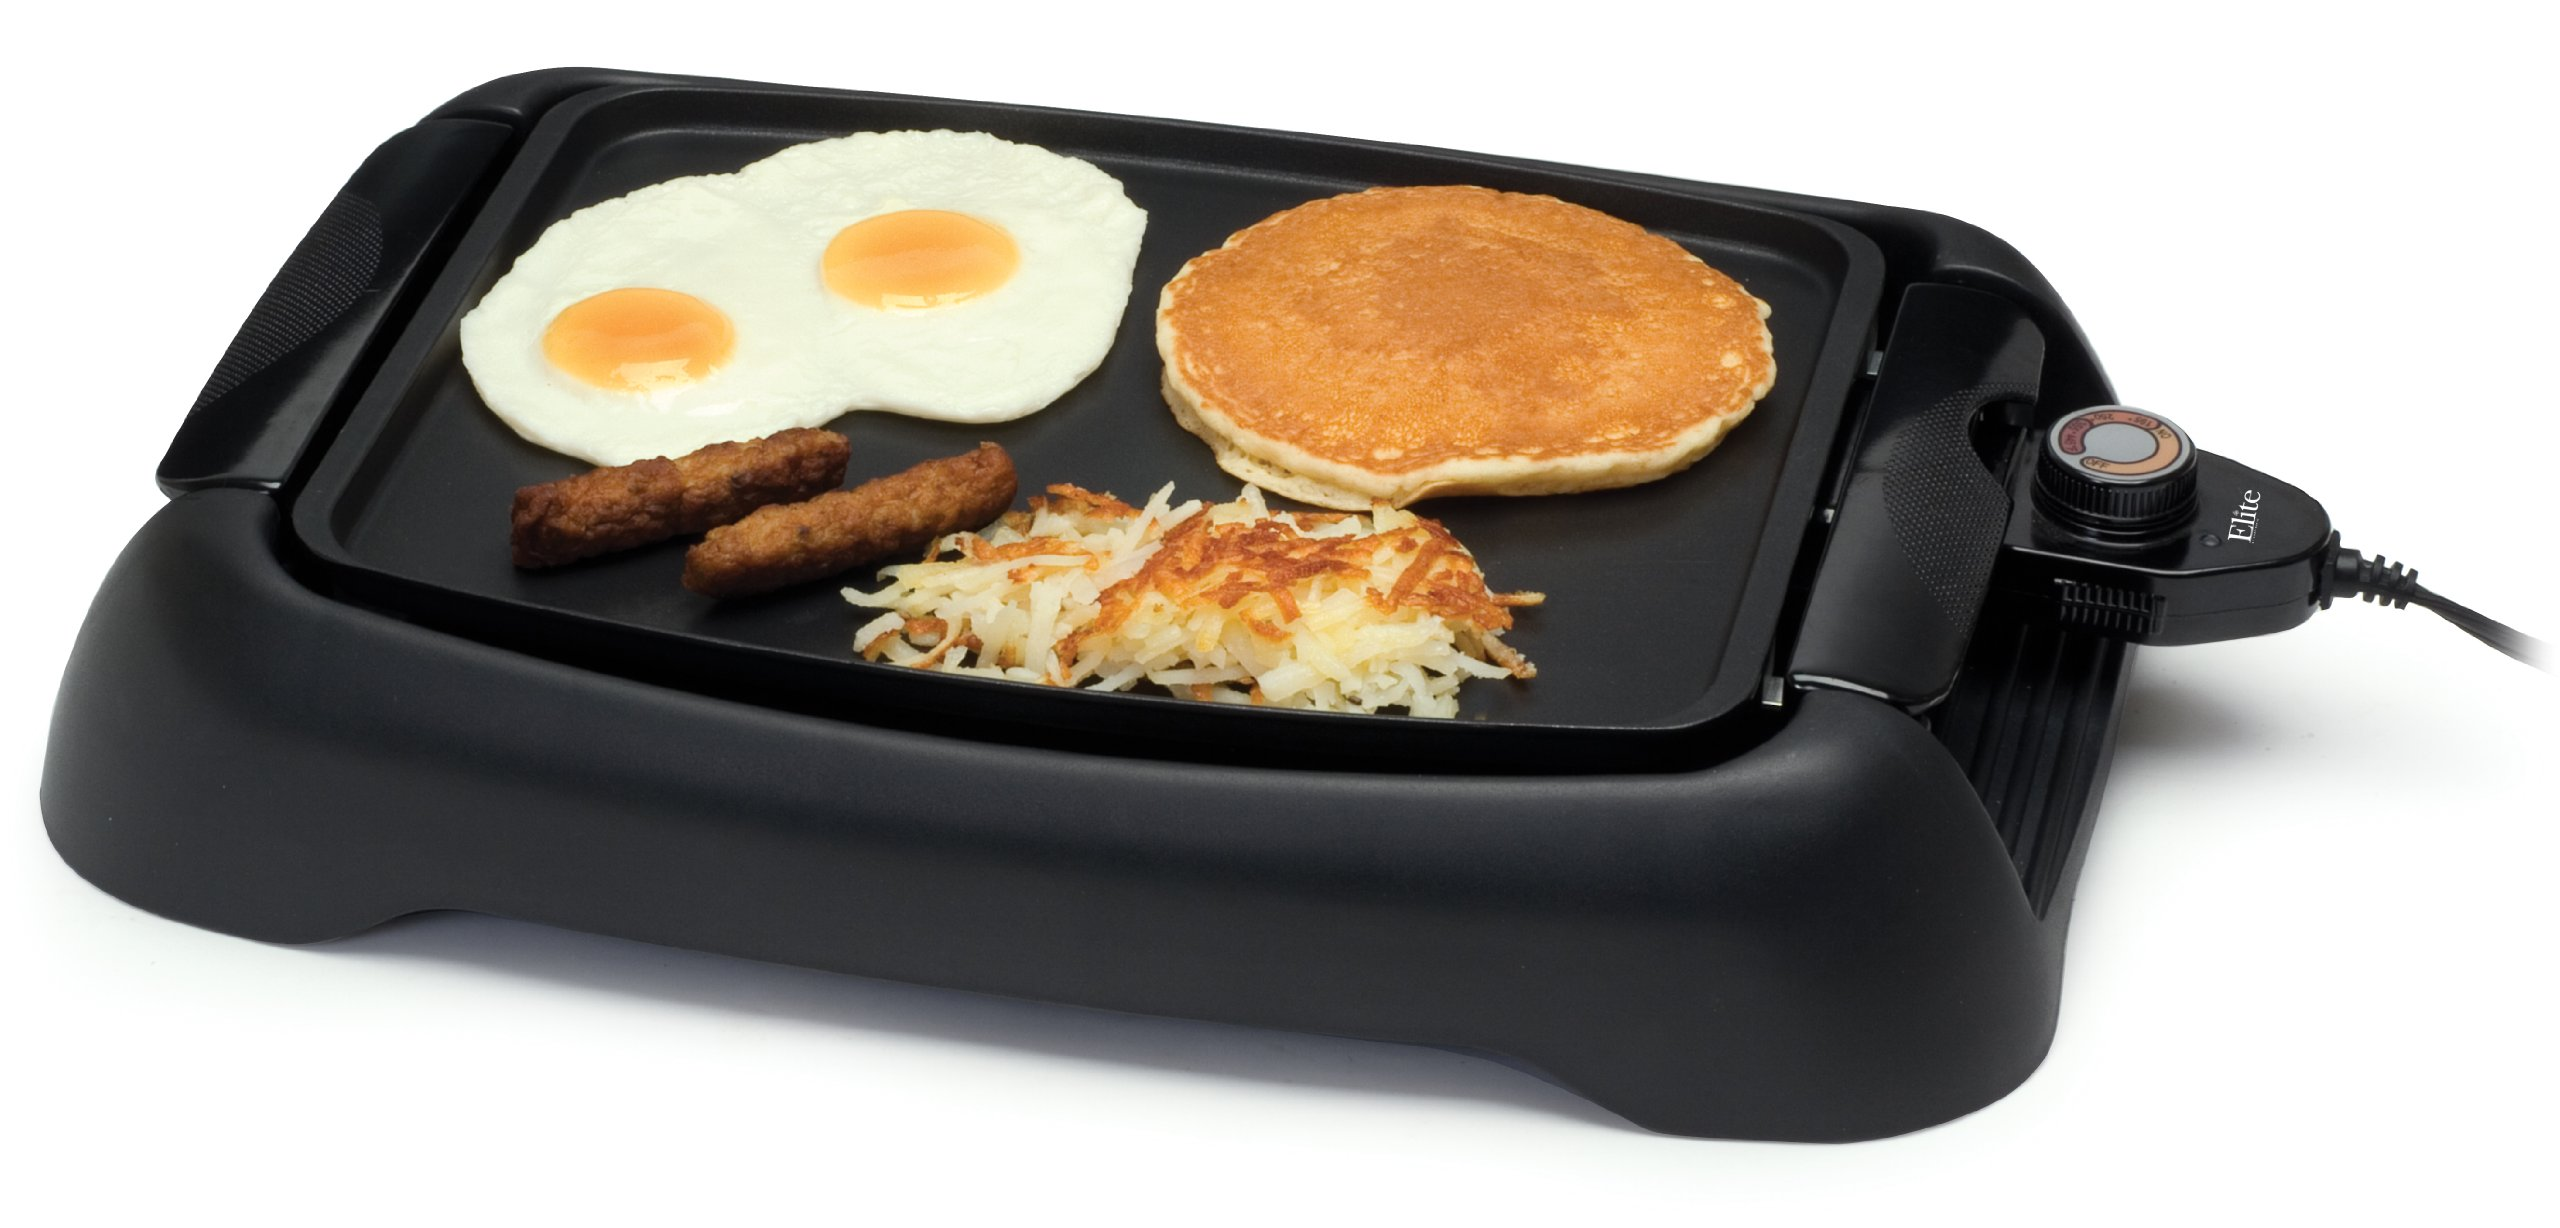 MaxiMatic EGL-3450GD Elite Cuisine 13-Inch Countertop Non-Stick Electric Indoor Grill, Black